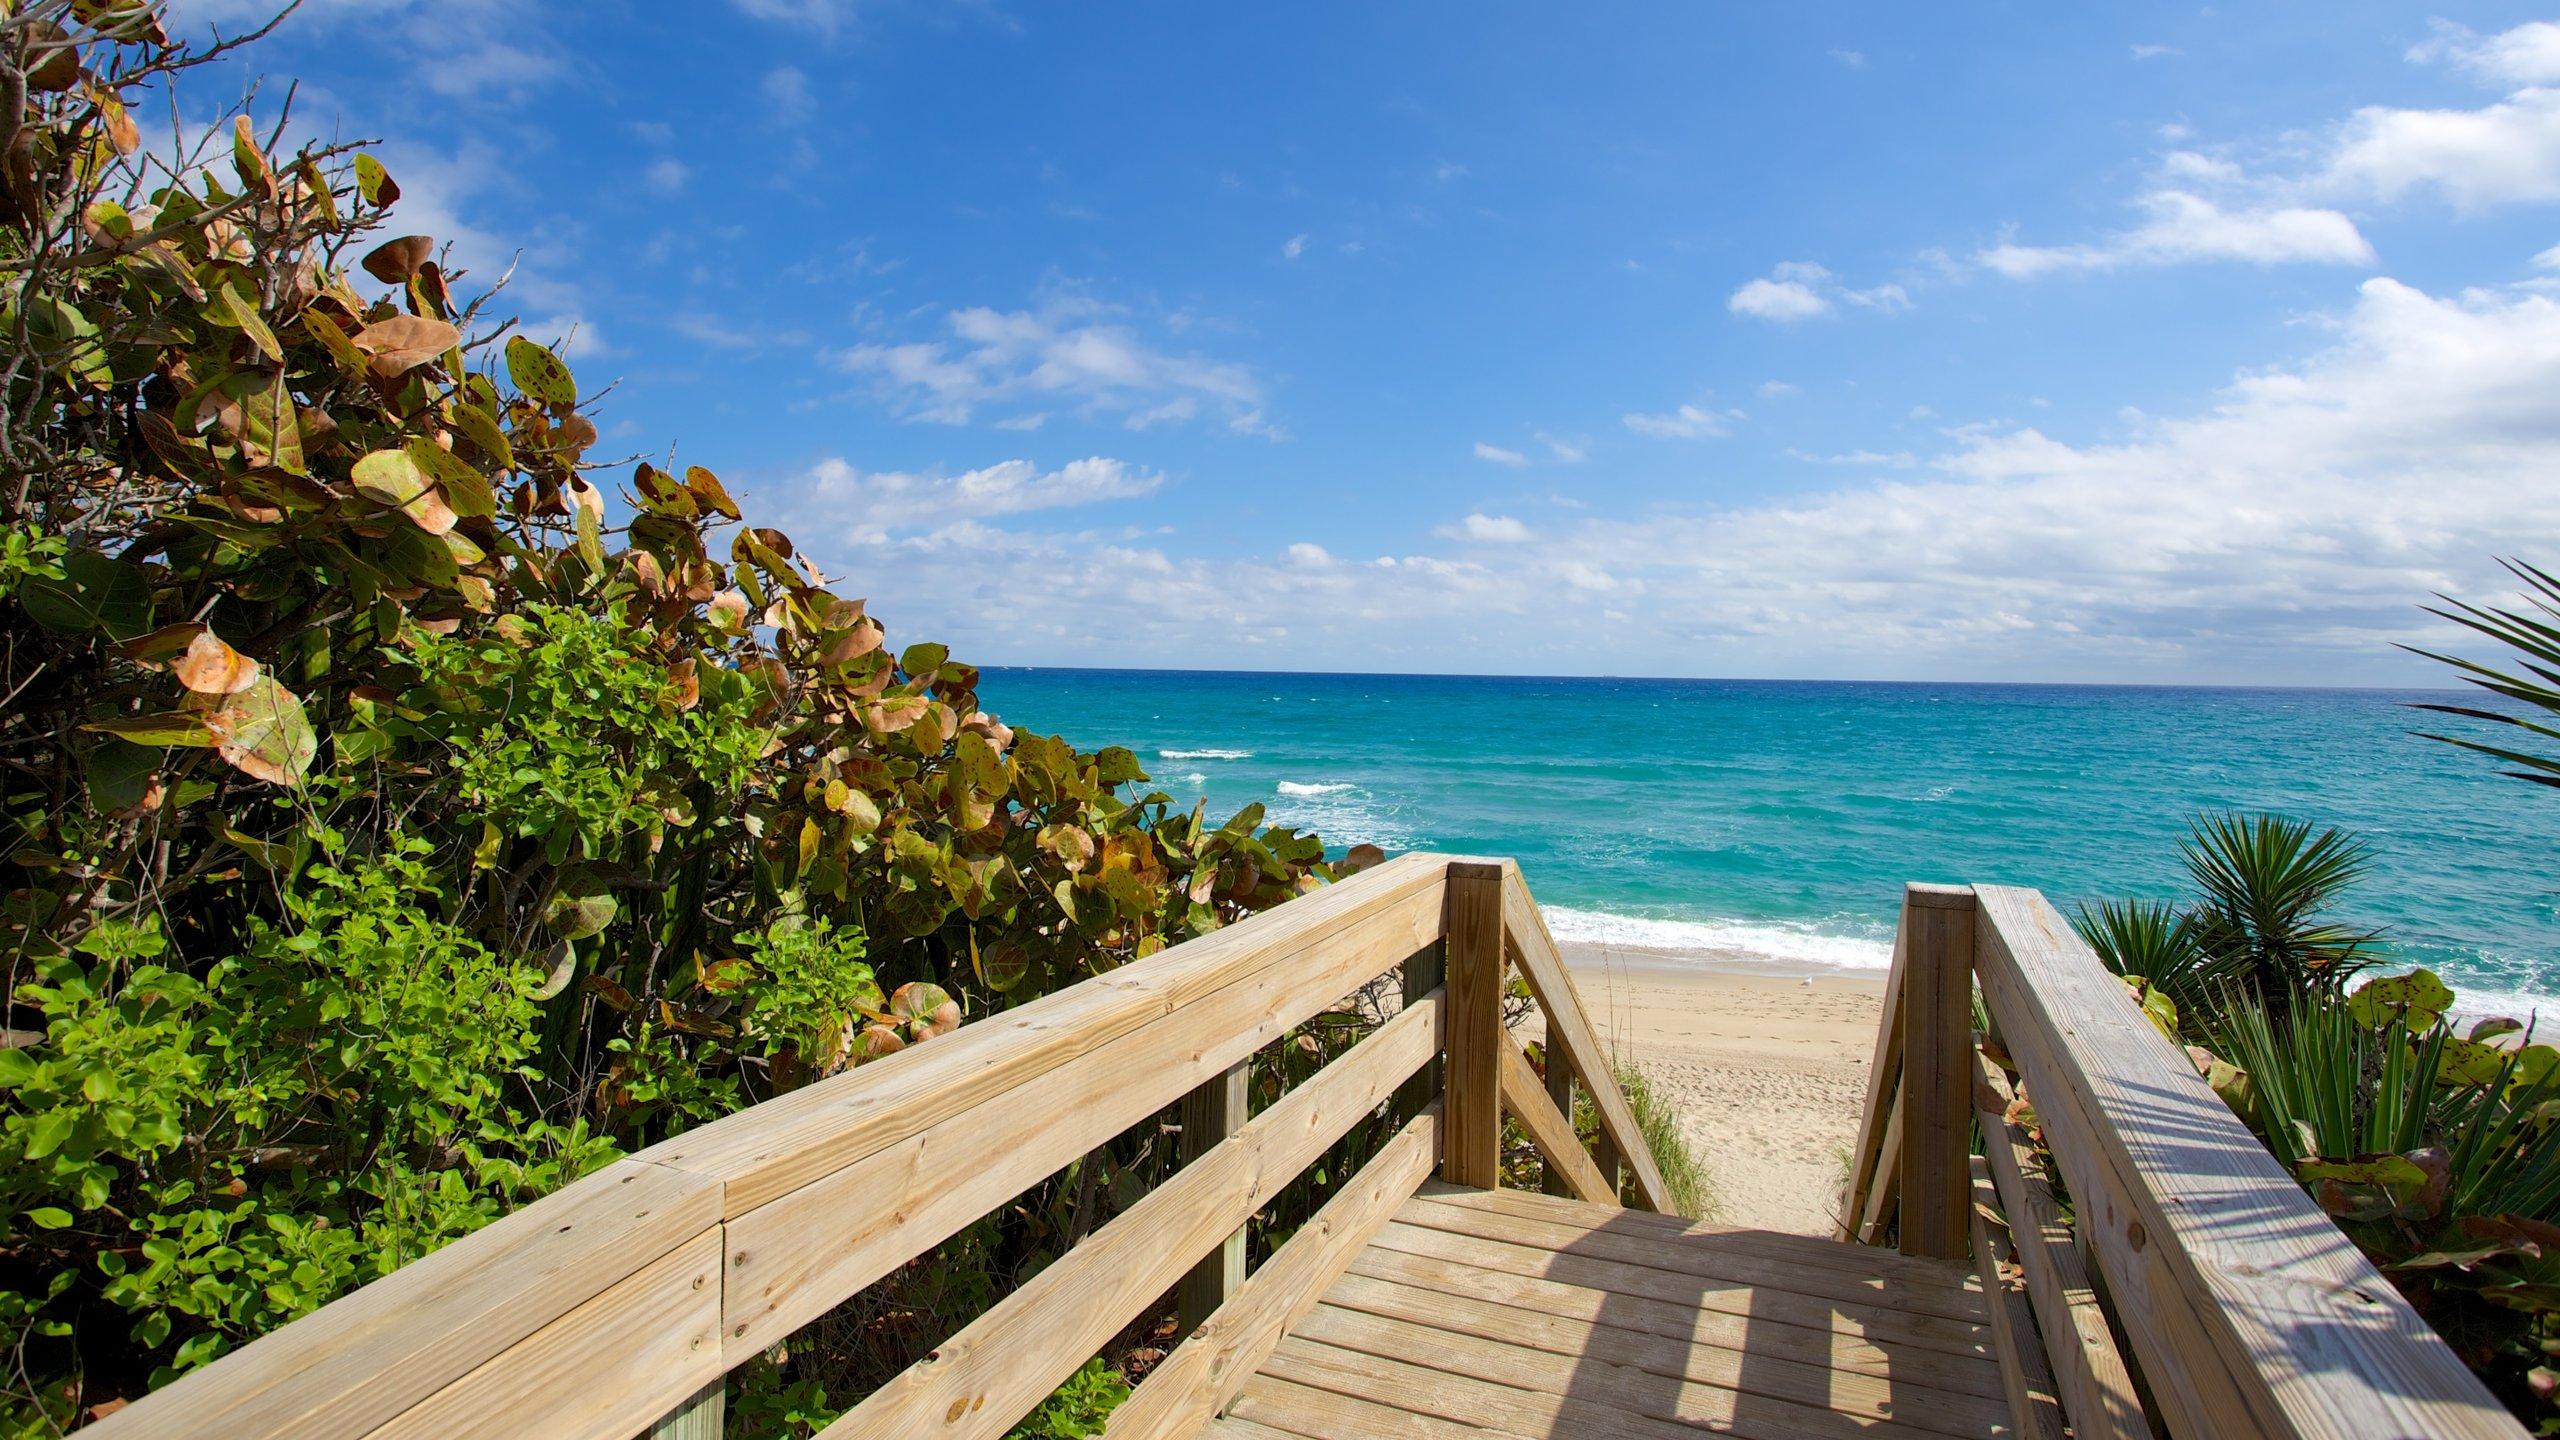 casinos in palm beach florida